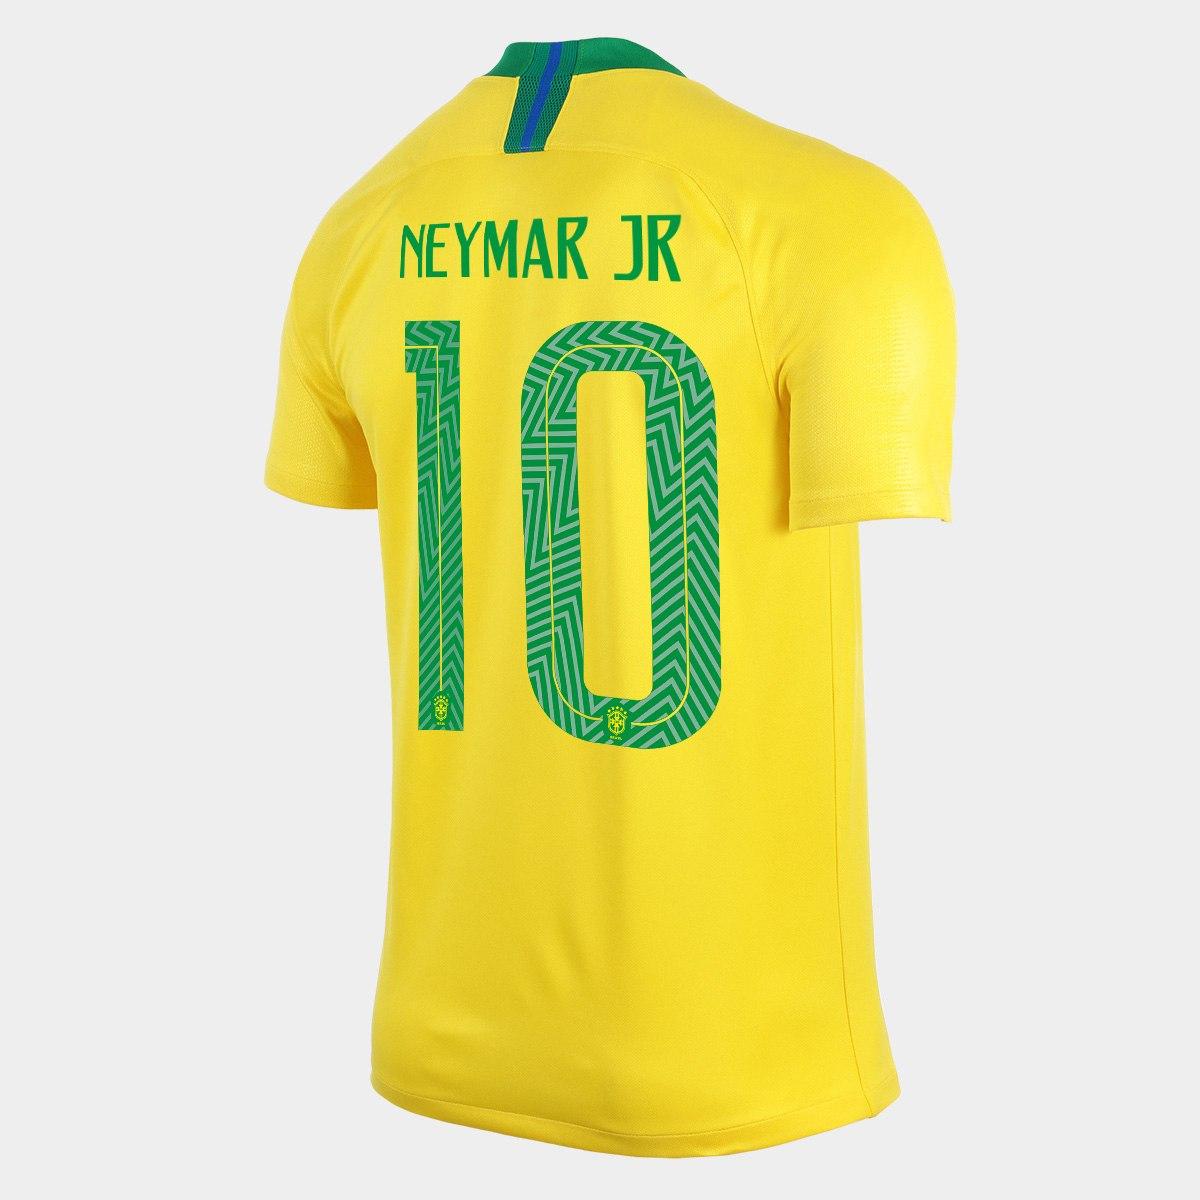 2c0f7df4375bf Camisa Brasil I Nike 2018 nº 10 Neymar Jr. - Futebol Cia - Paixao por  Futebol ...